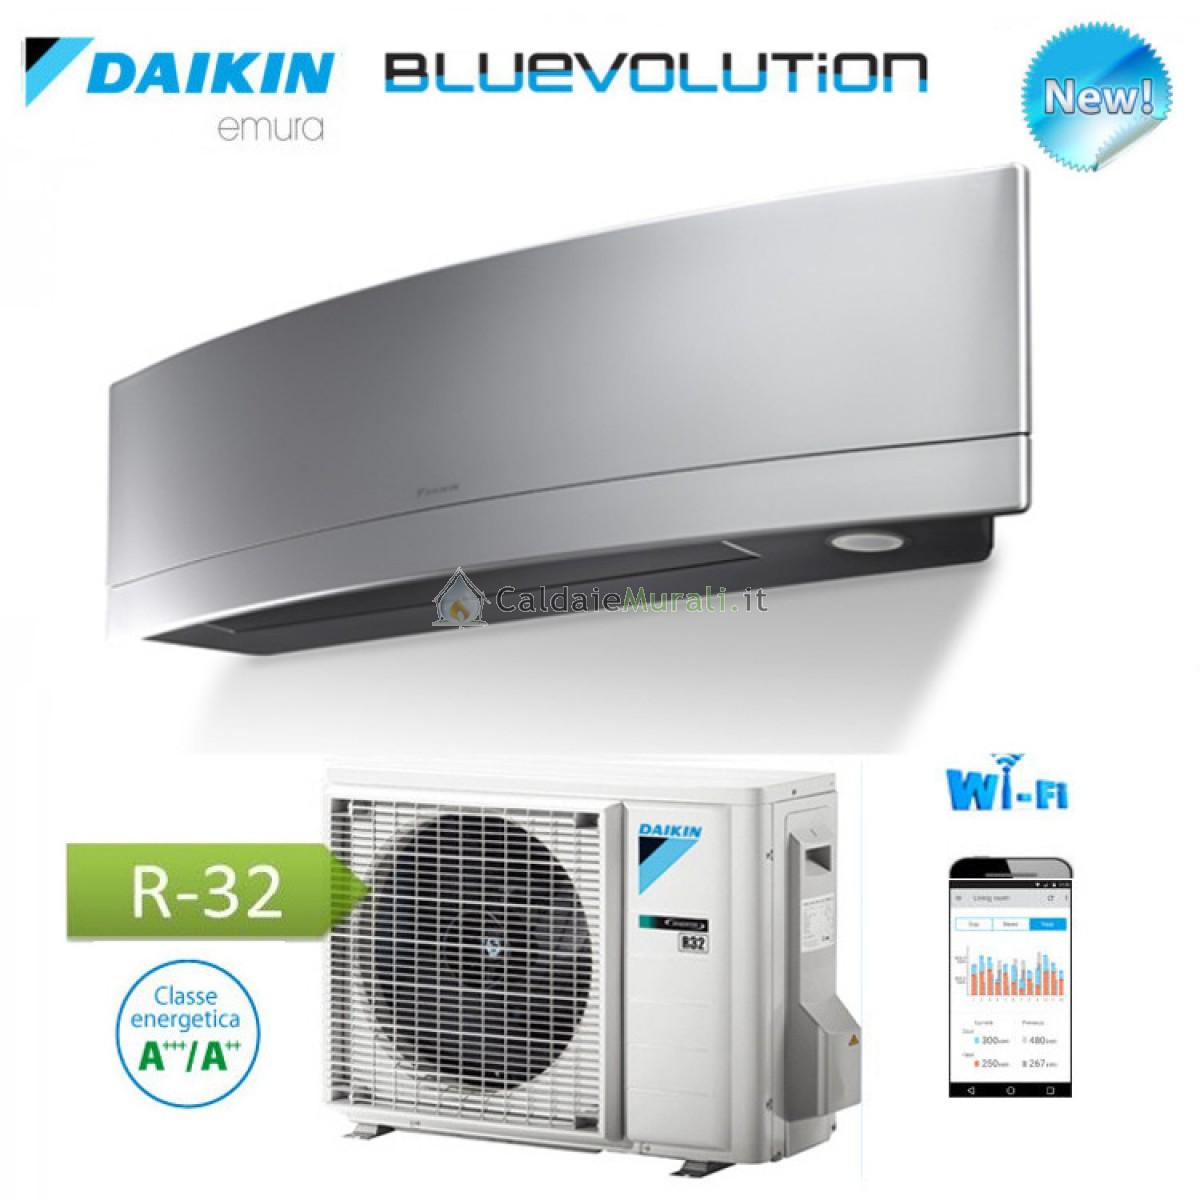 daikin bluevolution r32